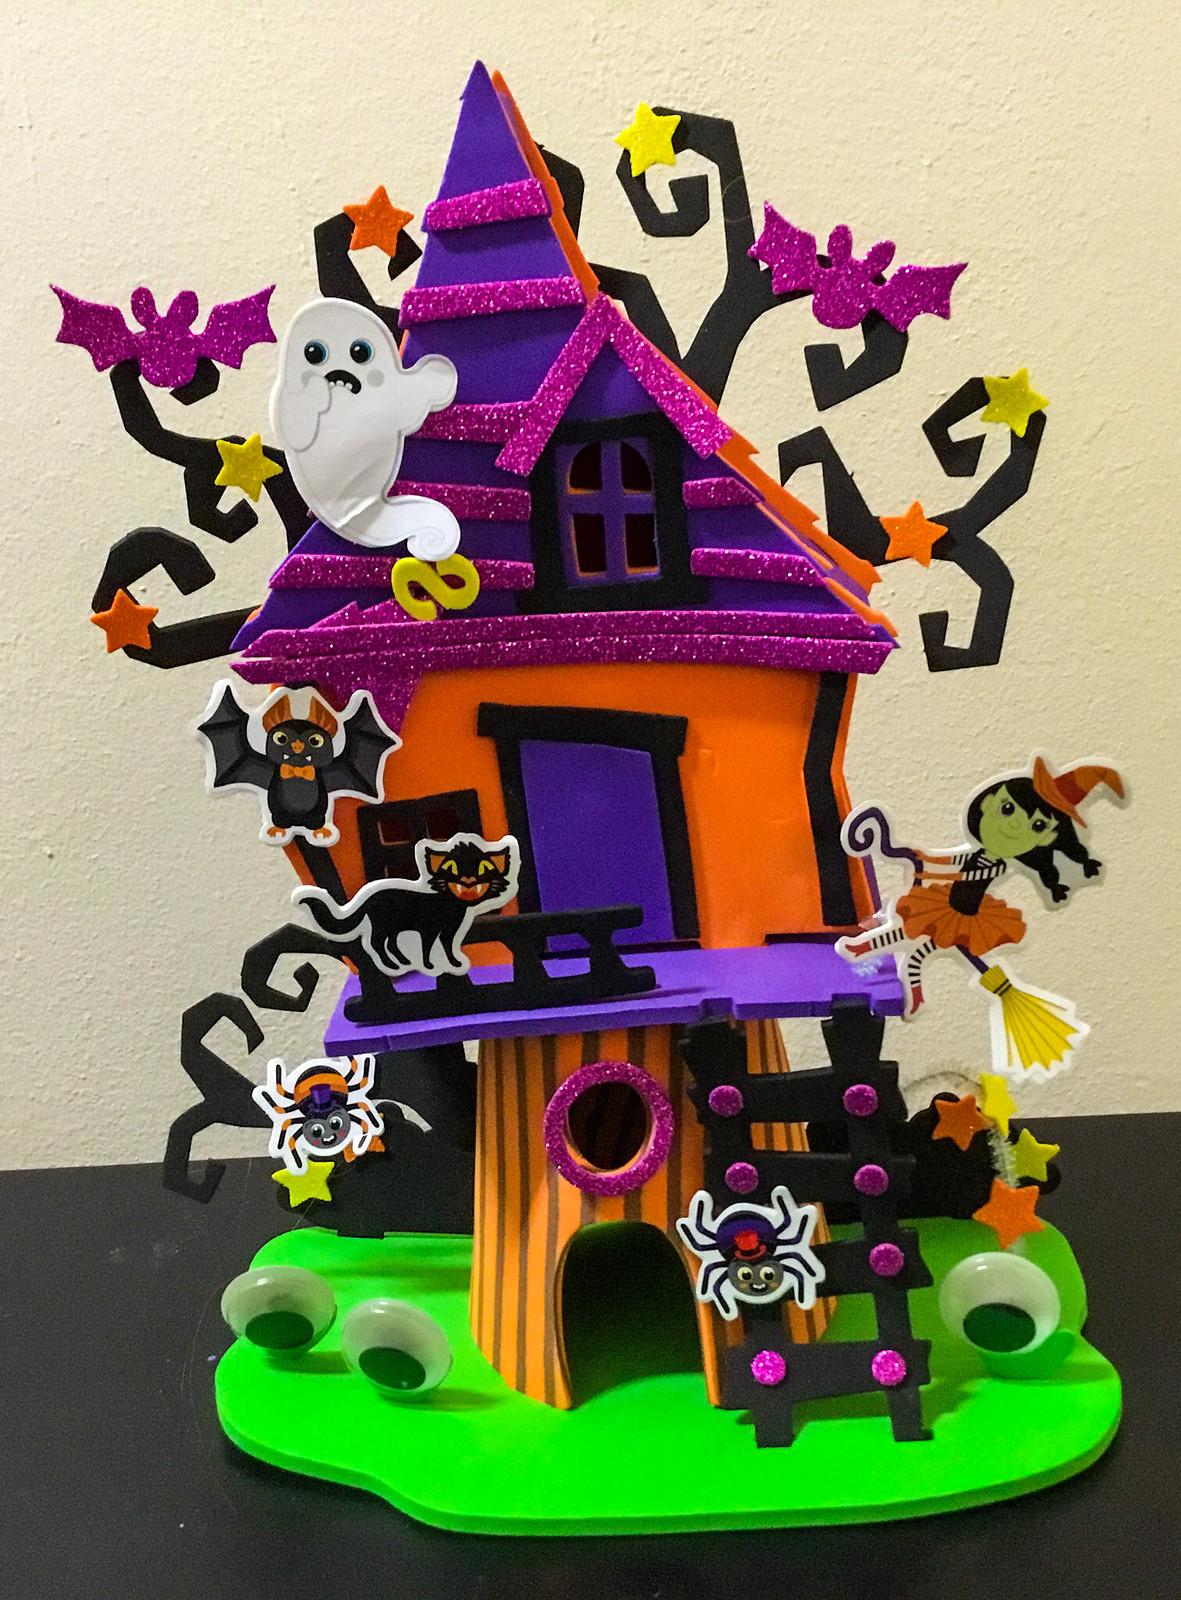 Building a 3D Foam Craft Spooky Treehouse